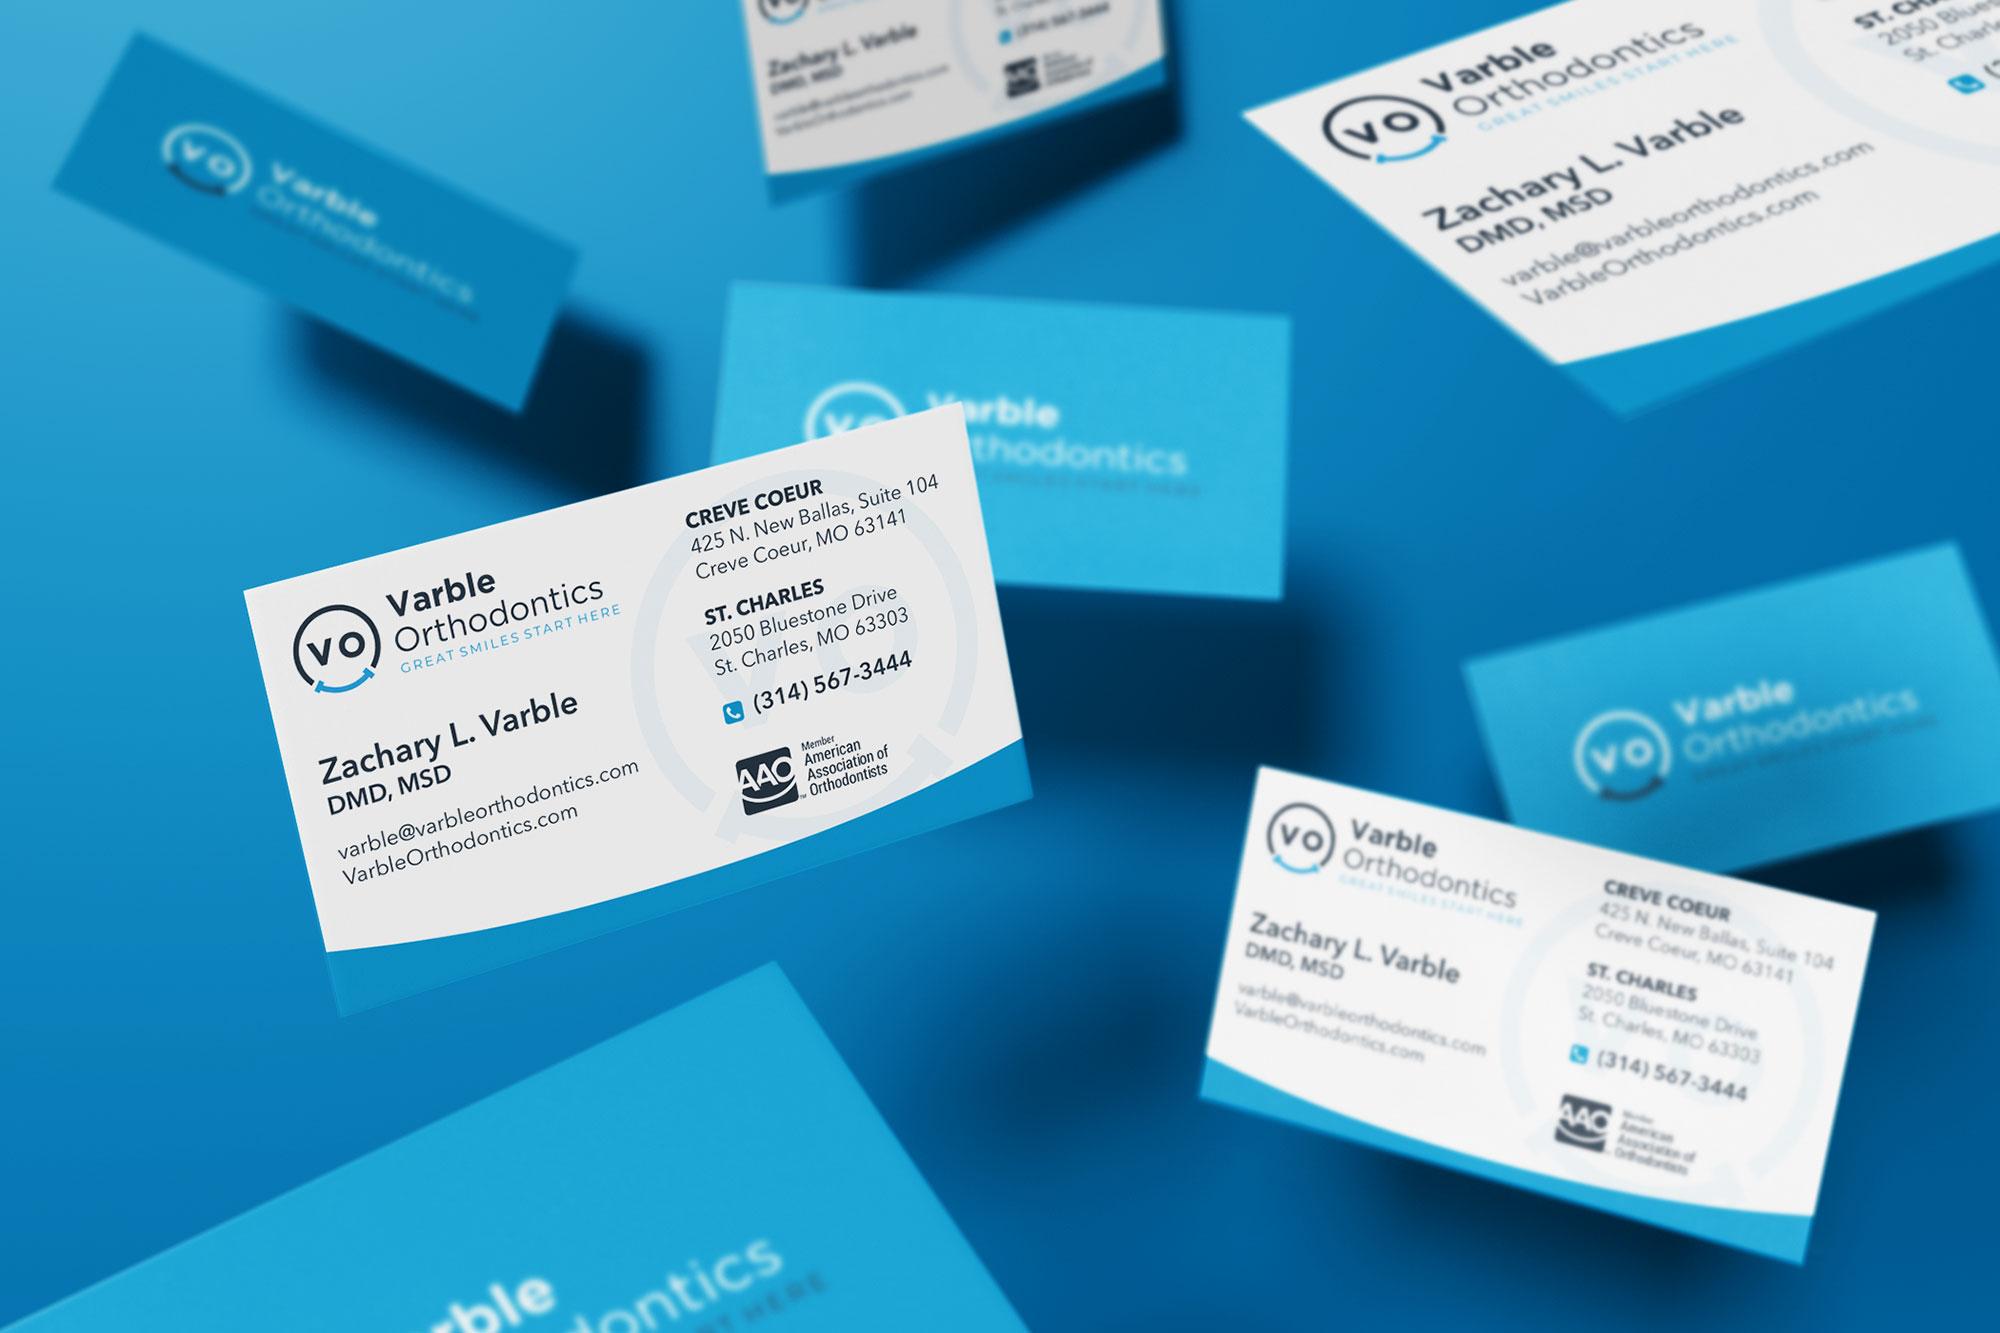 Varble business cards design